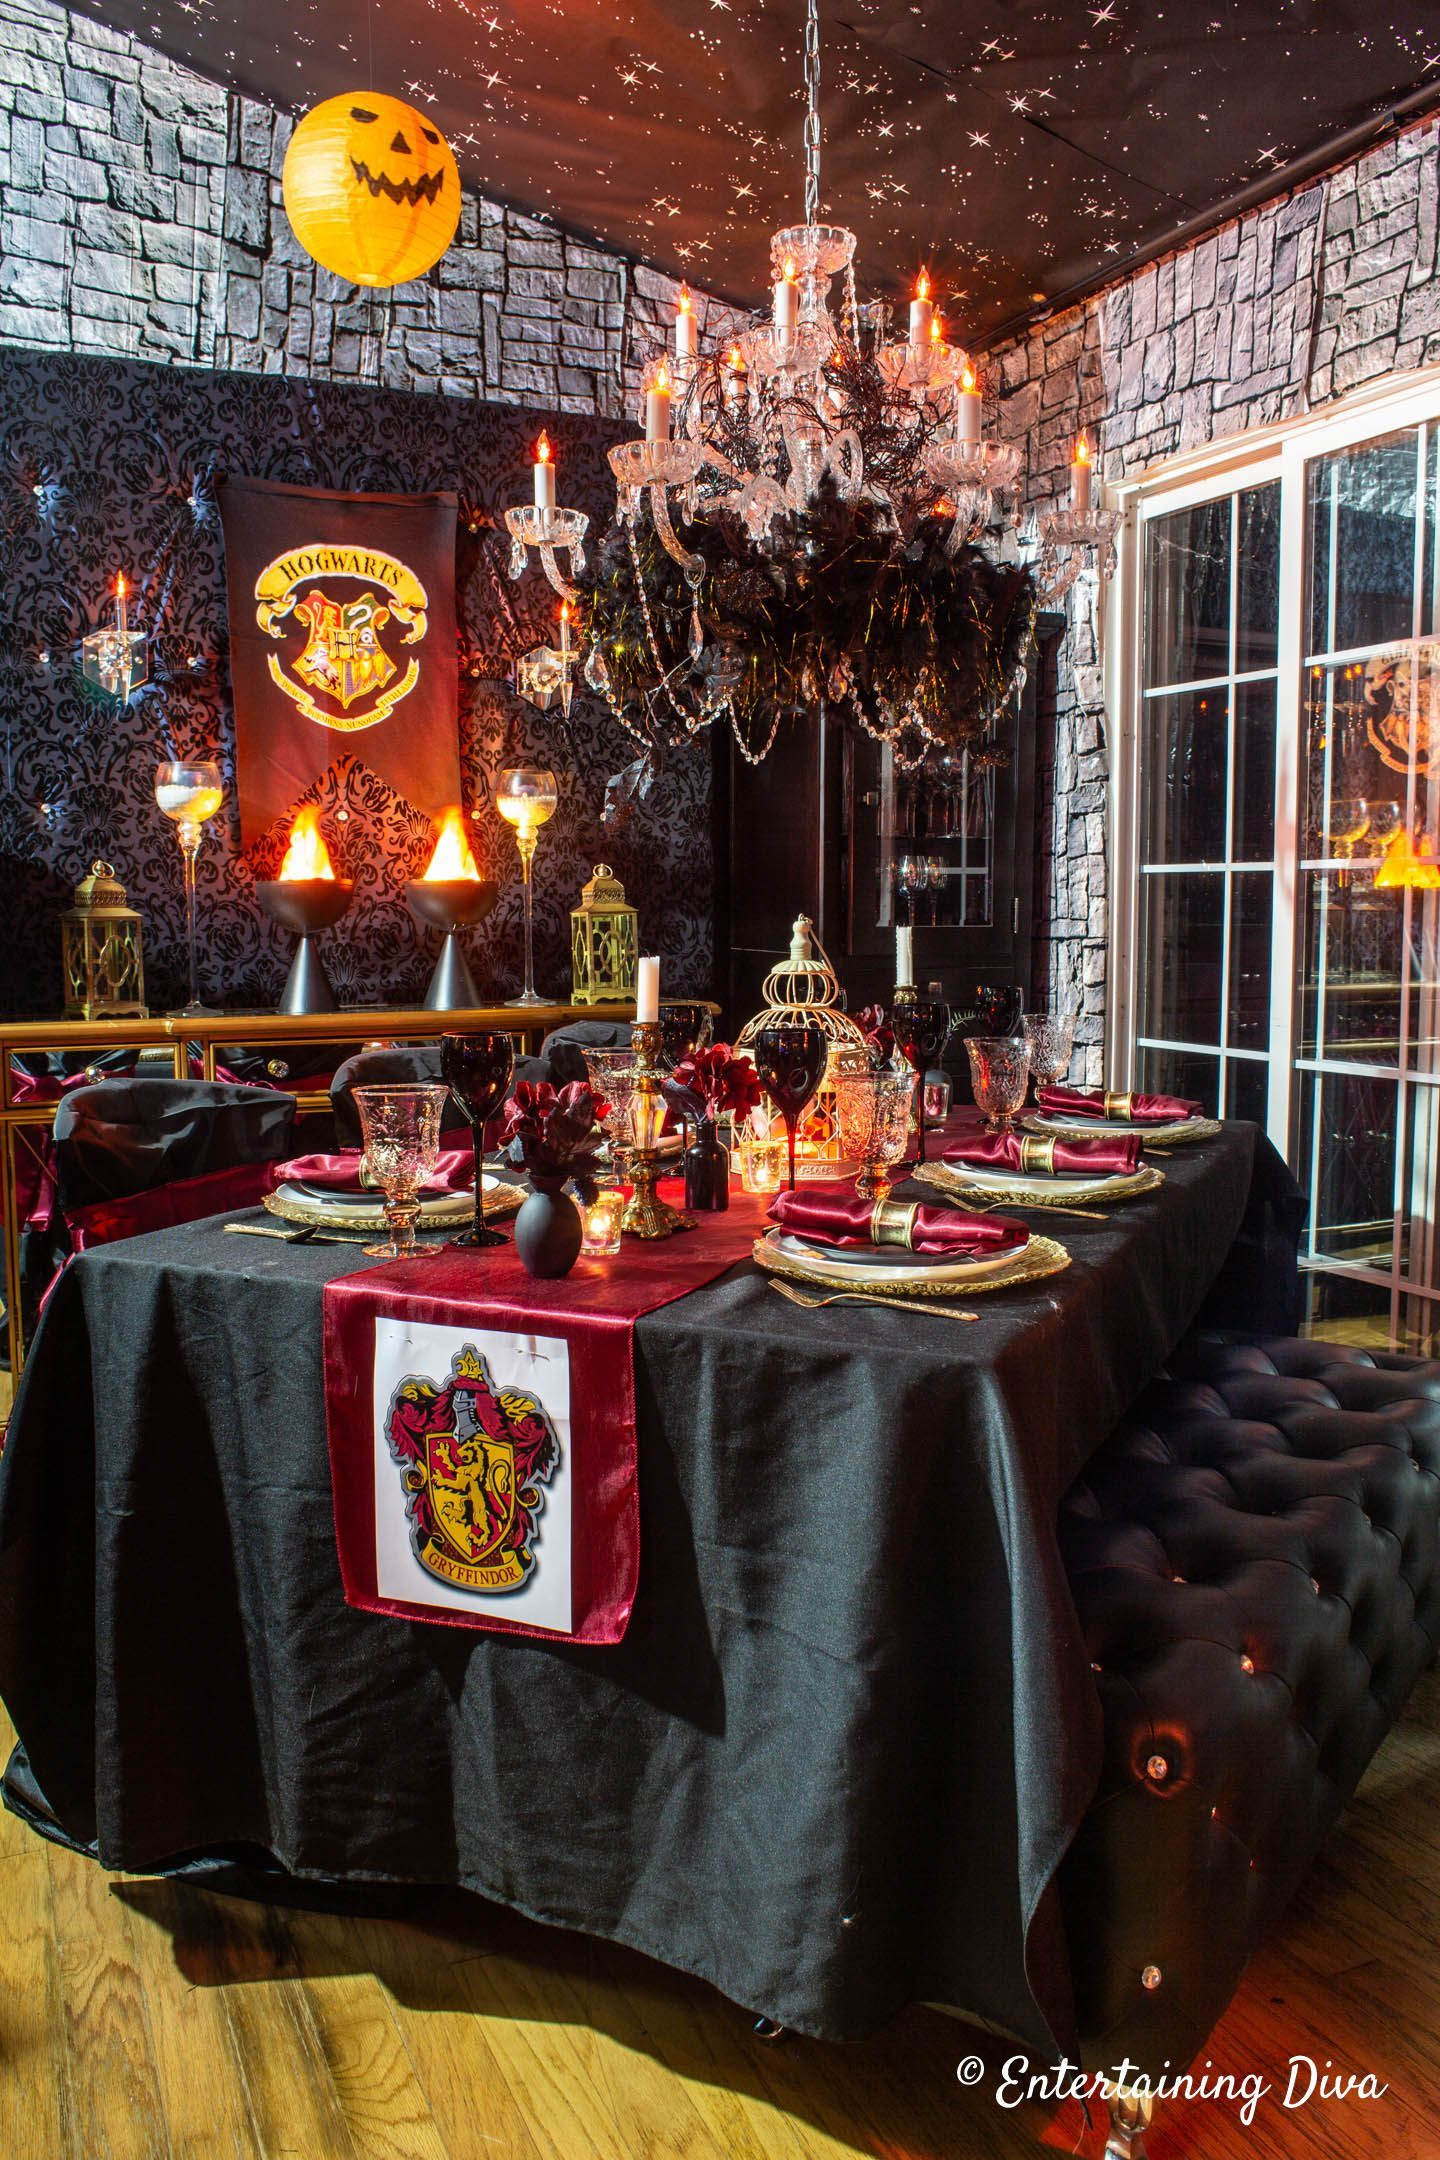 Harry Potter Table Decor Ideas Entertaining Diva From House To Home Harry Potter Table Harry Potter Halloween Party Harry Potter Party Decorations